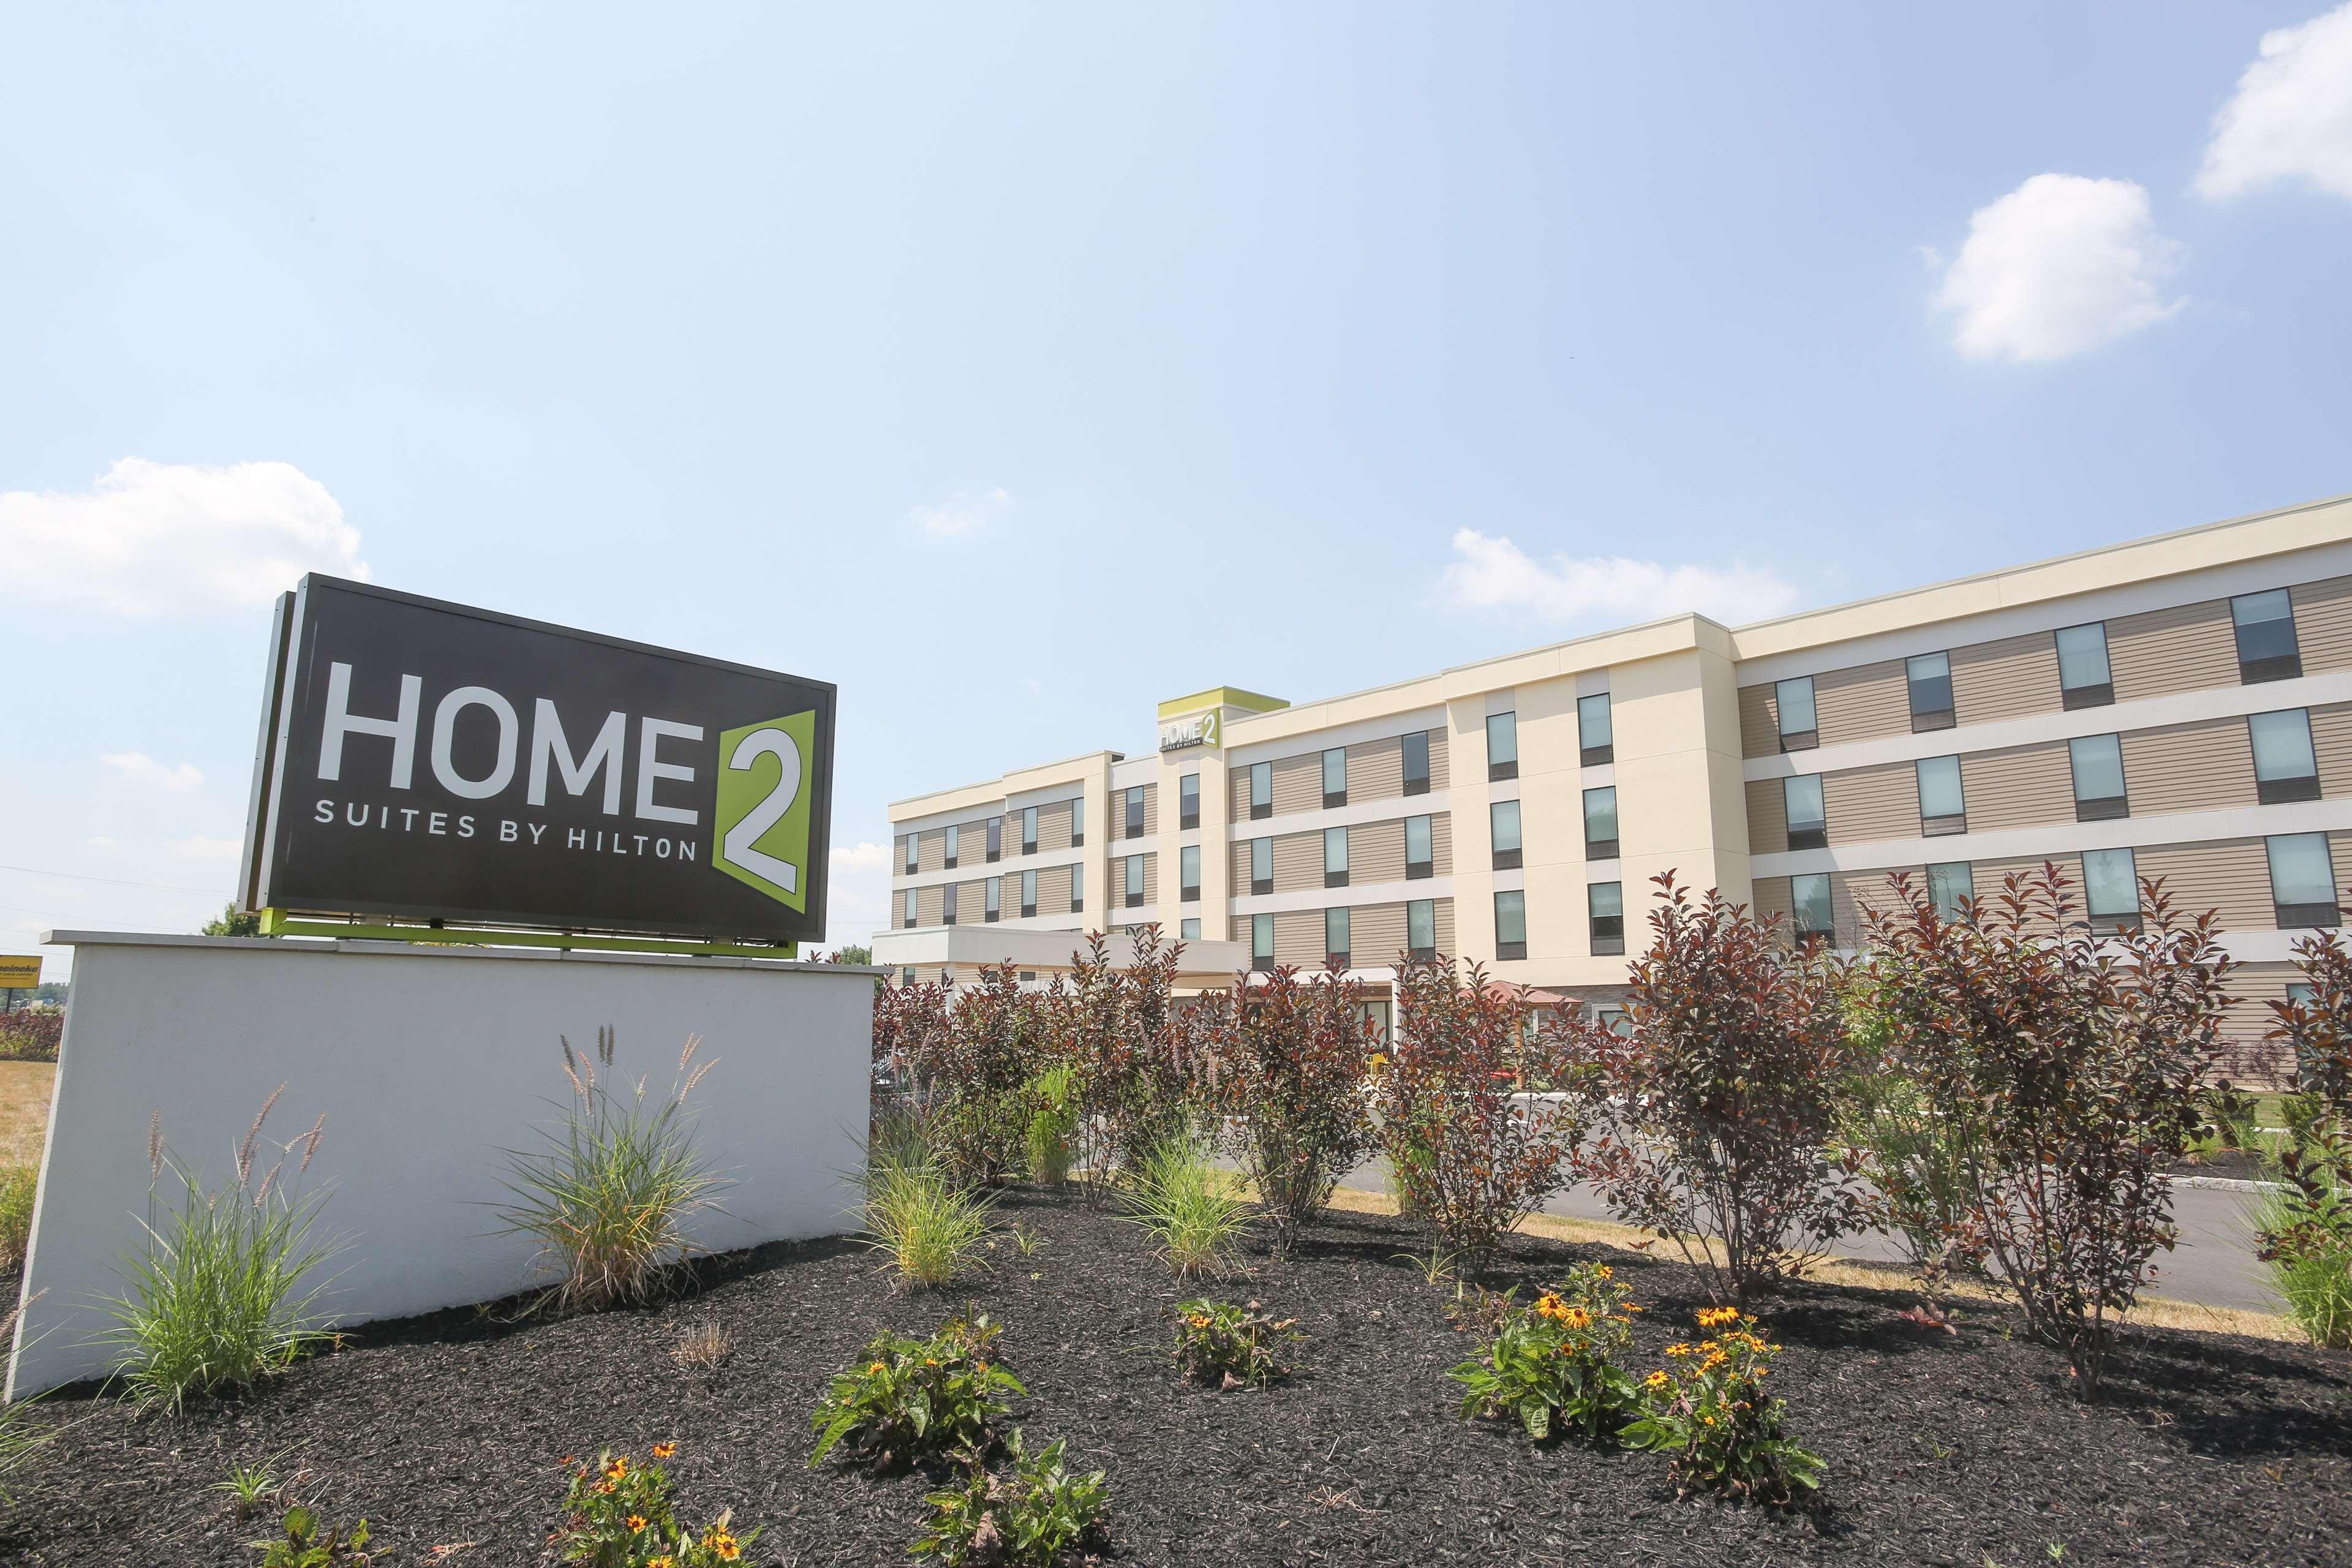 Home2 Suites by Hilton Bordentown image 2